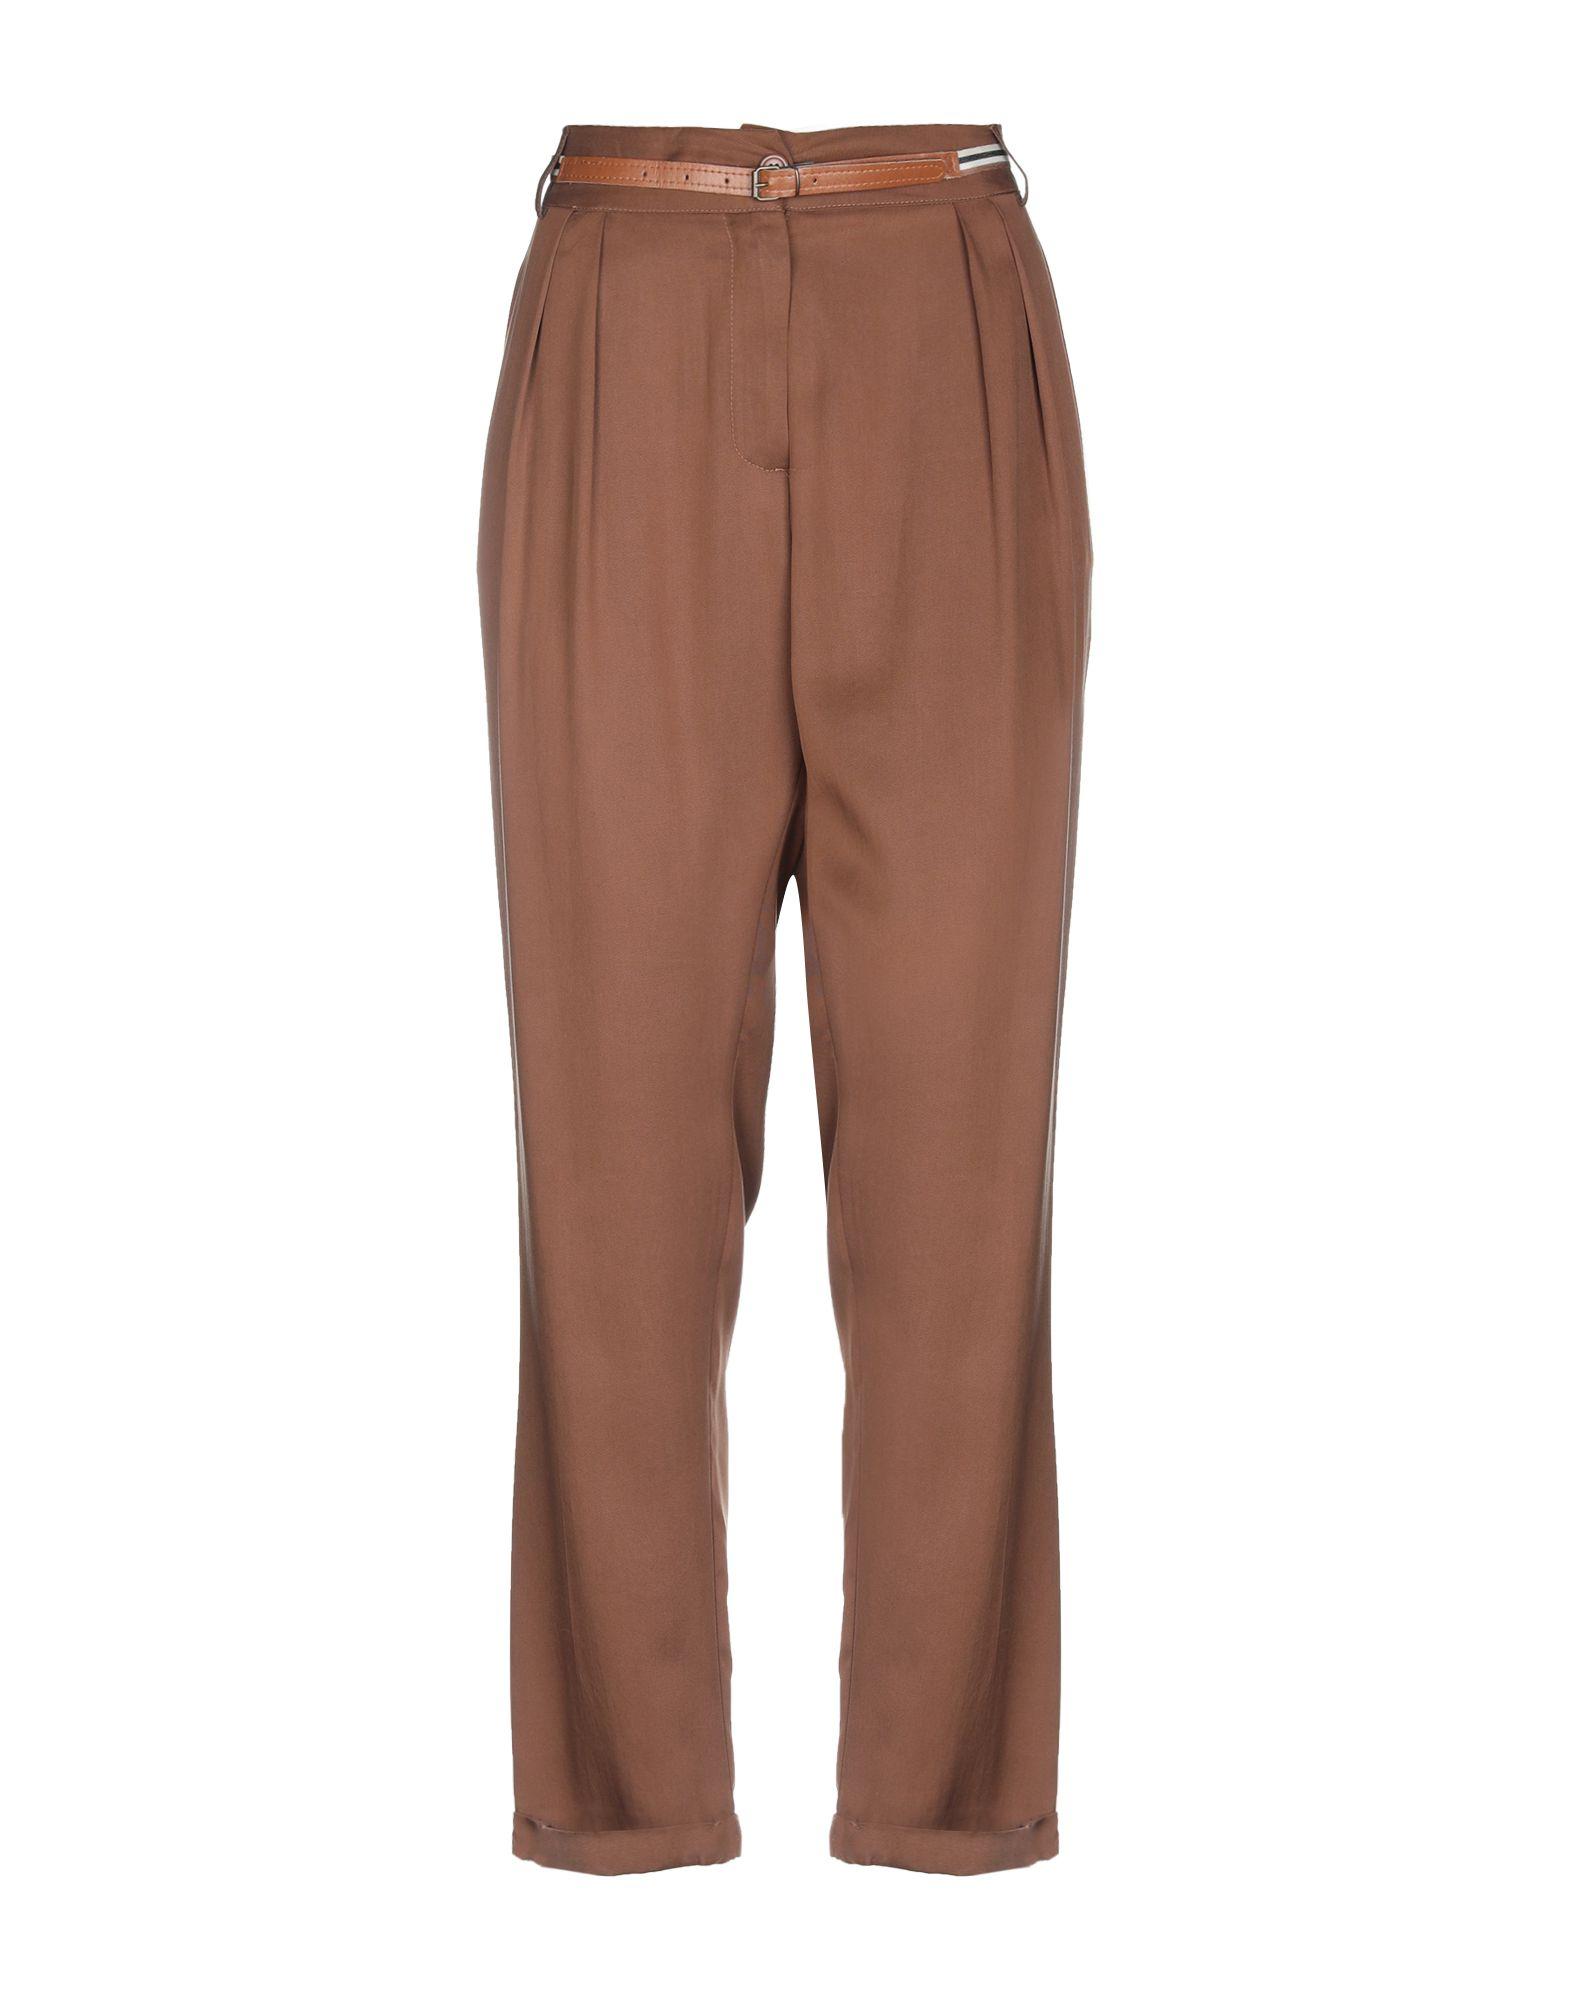 Фото - MAISON JEAN Повседневные брюки jean paul gaultier le male